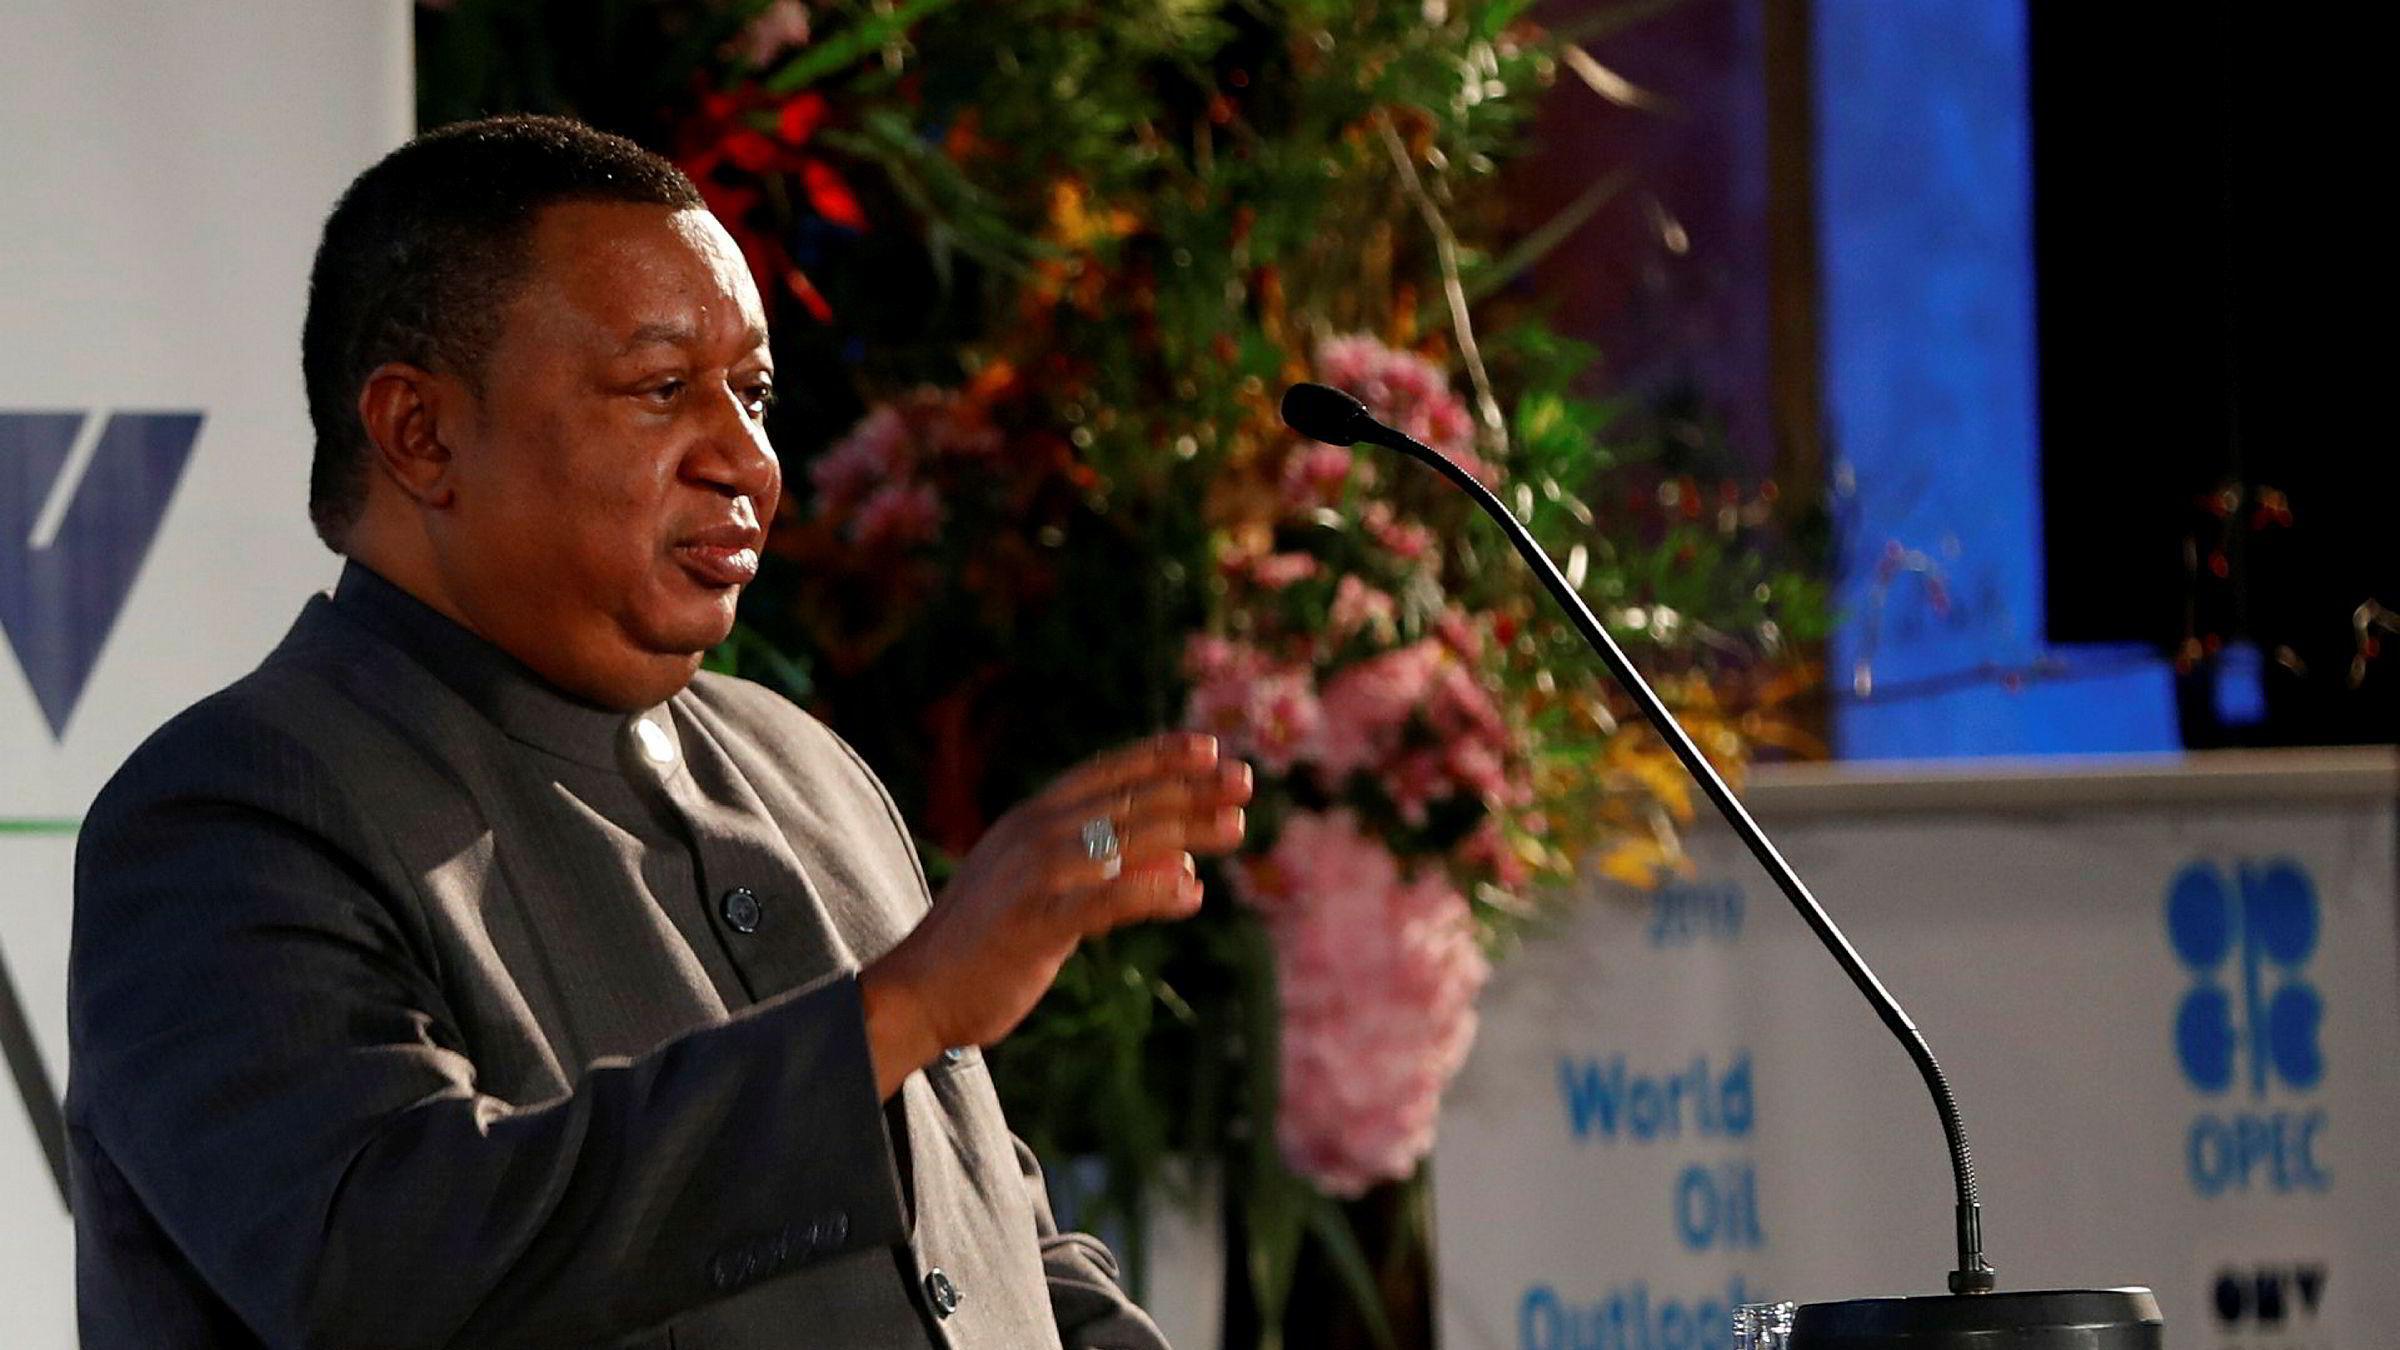 Opec-leder Mohammad Barkindo fra Nigeria holder tale på World Oil Outlook 2040.